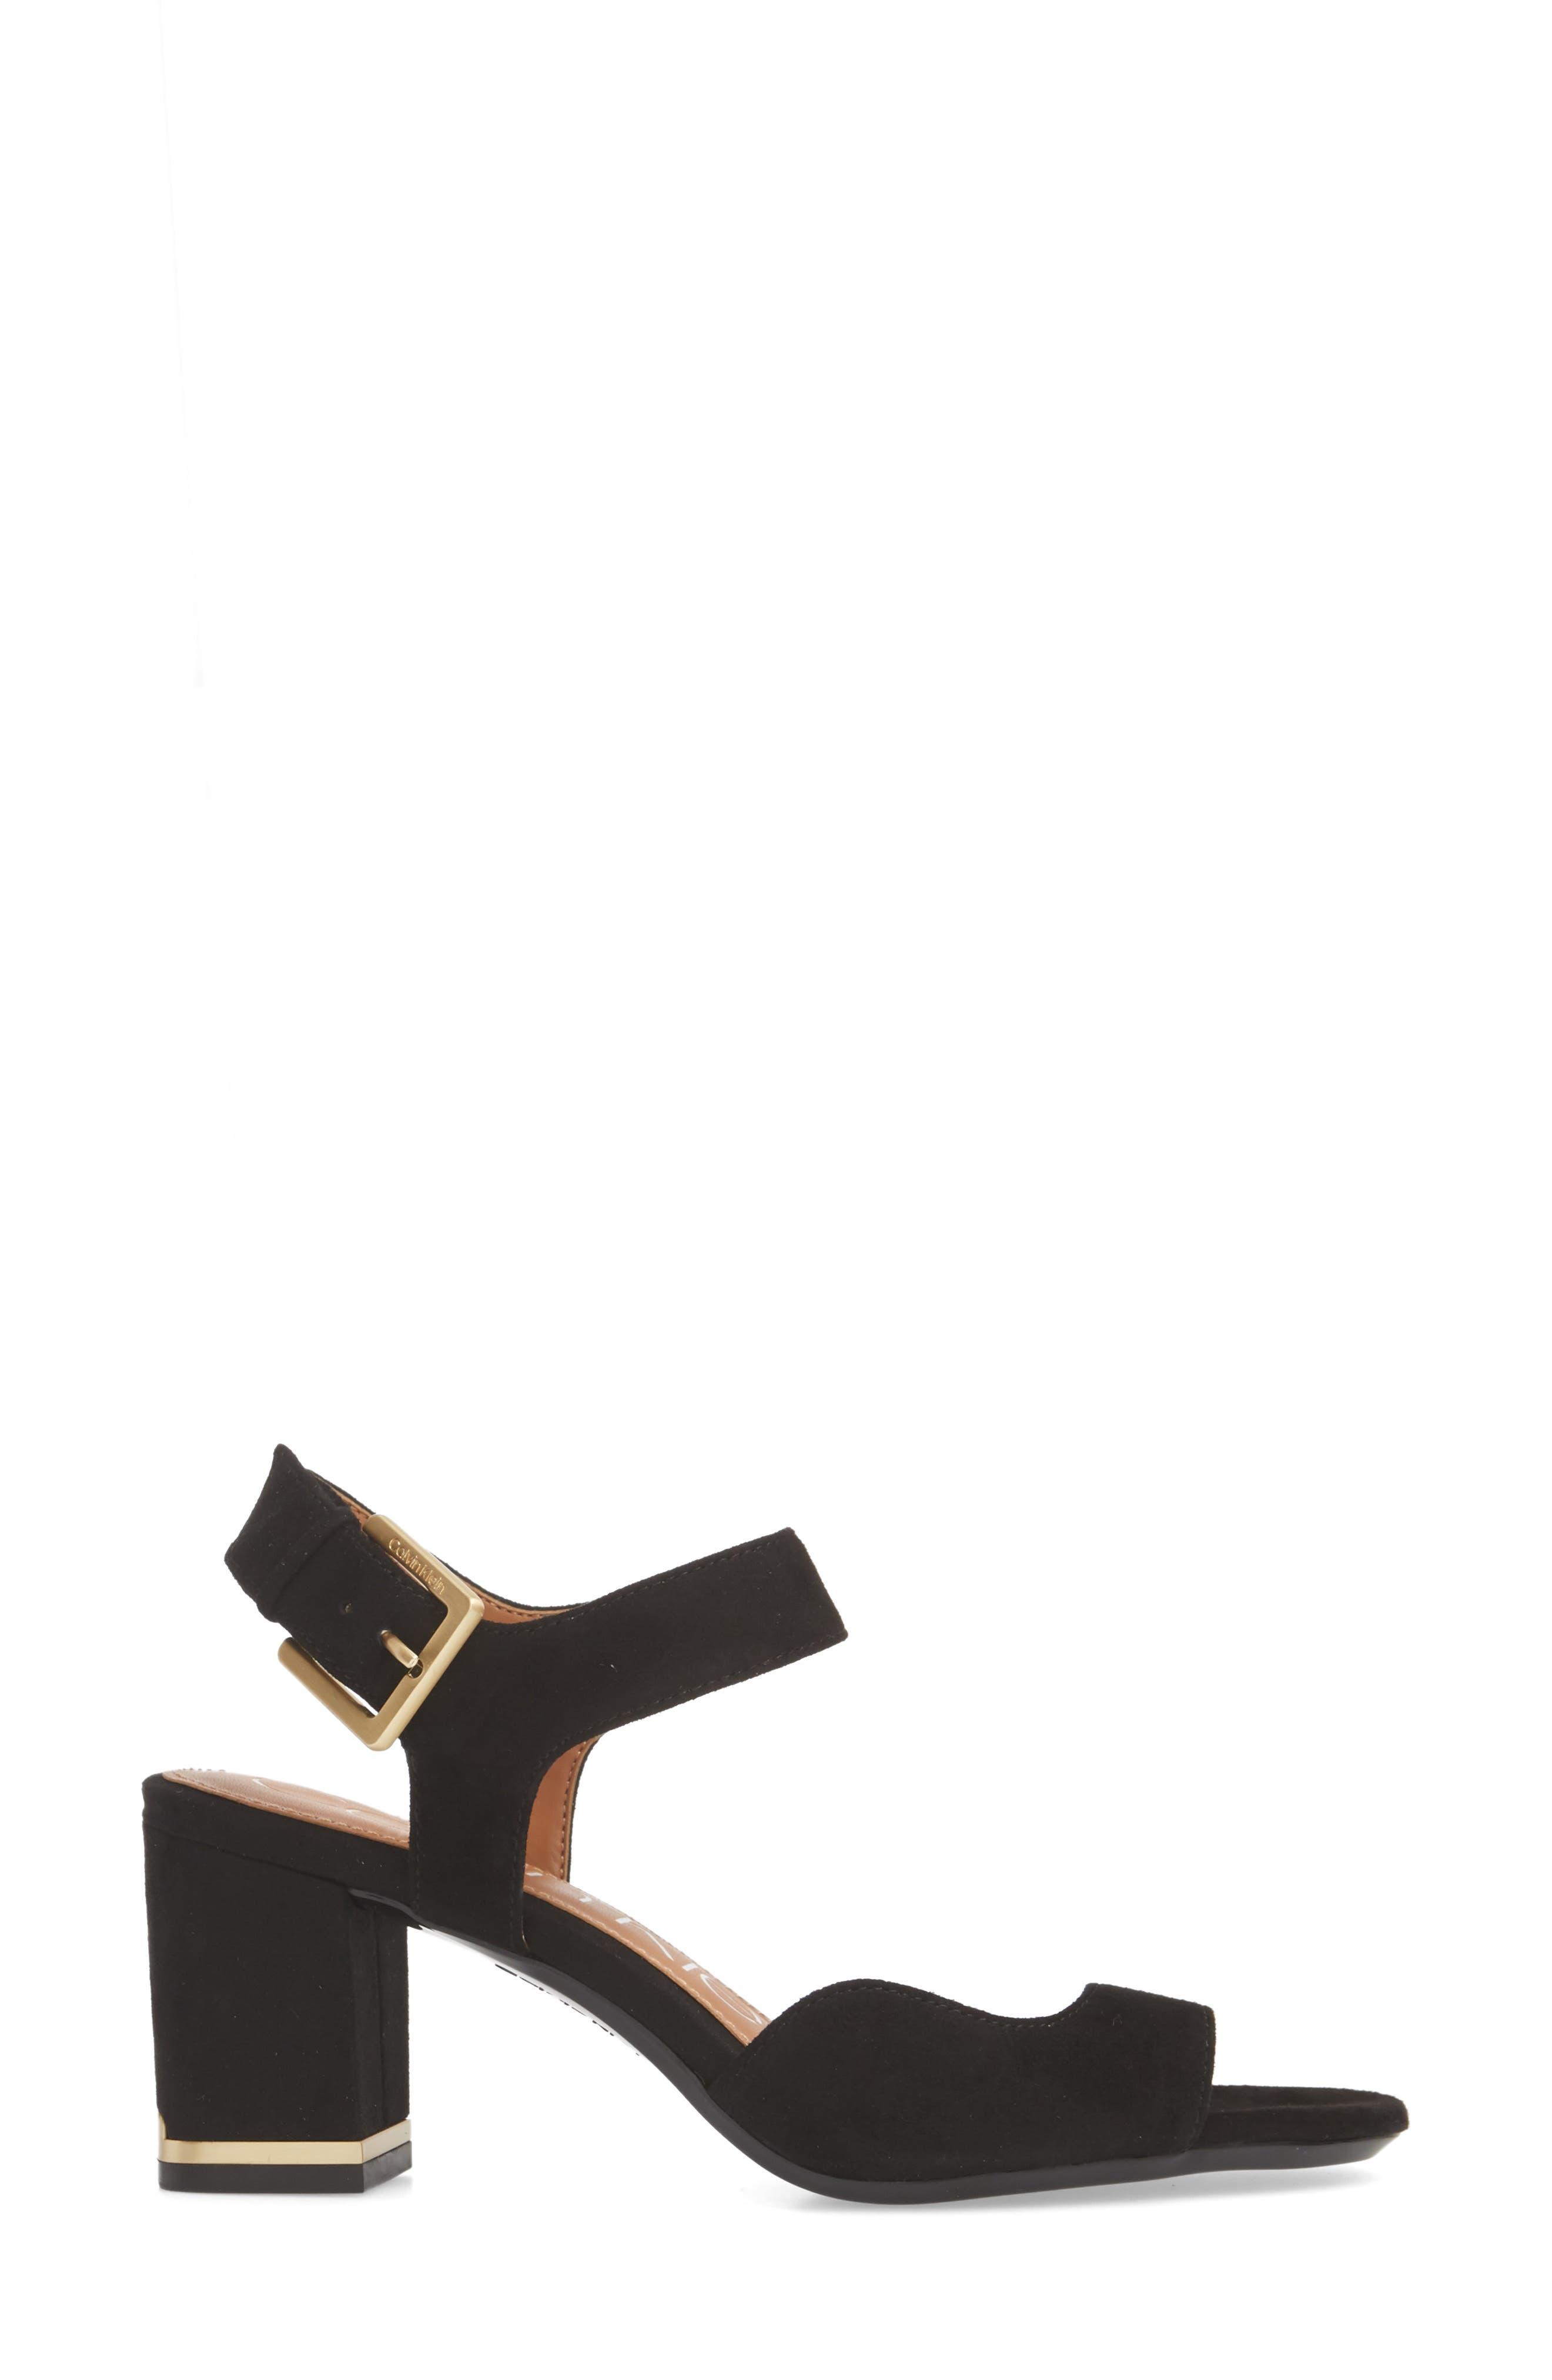 Chantay Asymmetrical Sandal,                             Alternate thumbnail 3, color,                             001